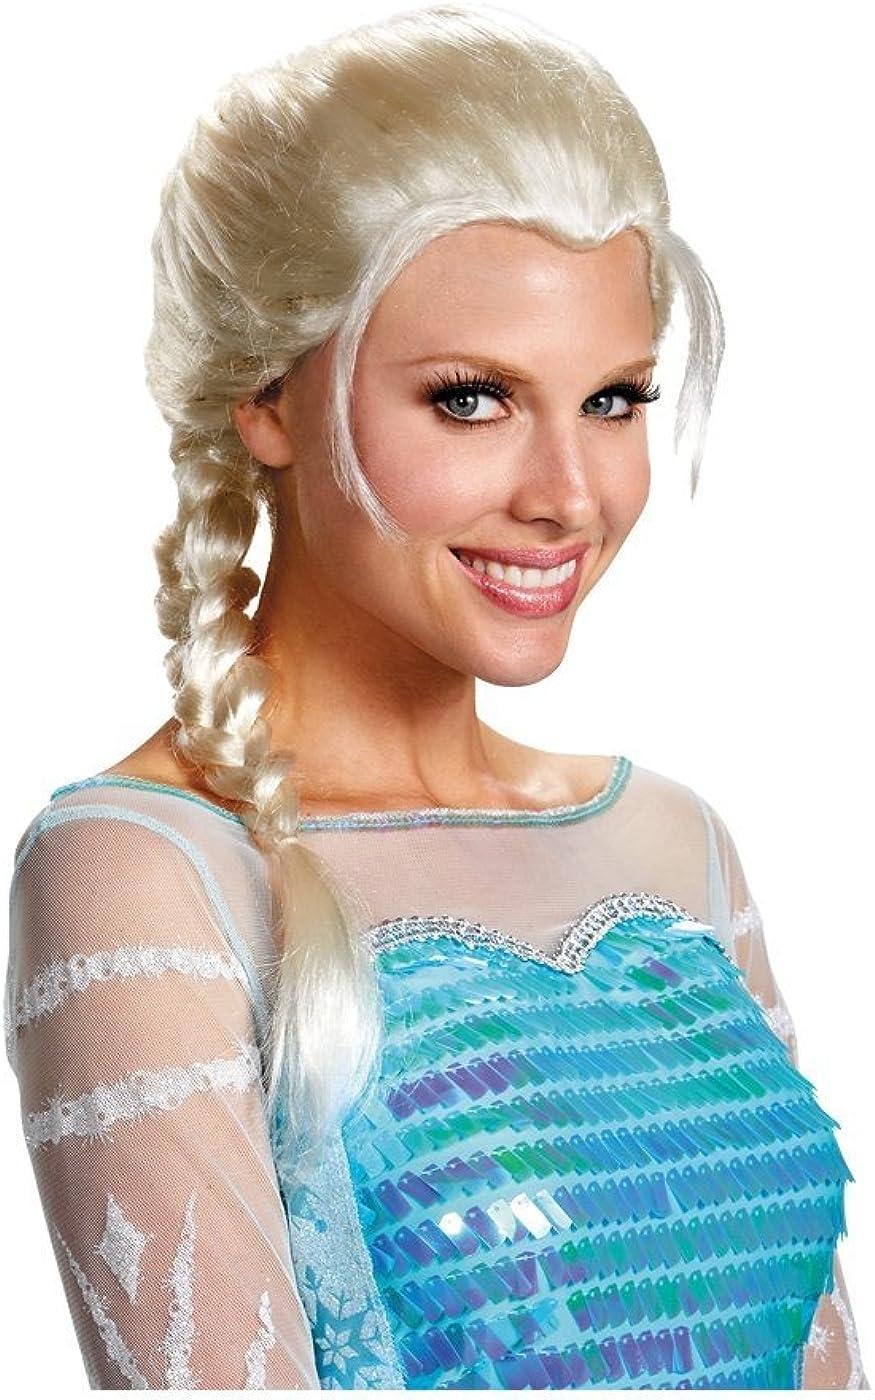 Adult Elsa Wig Frozen Costume Wig Disney Princess Wig 83206